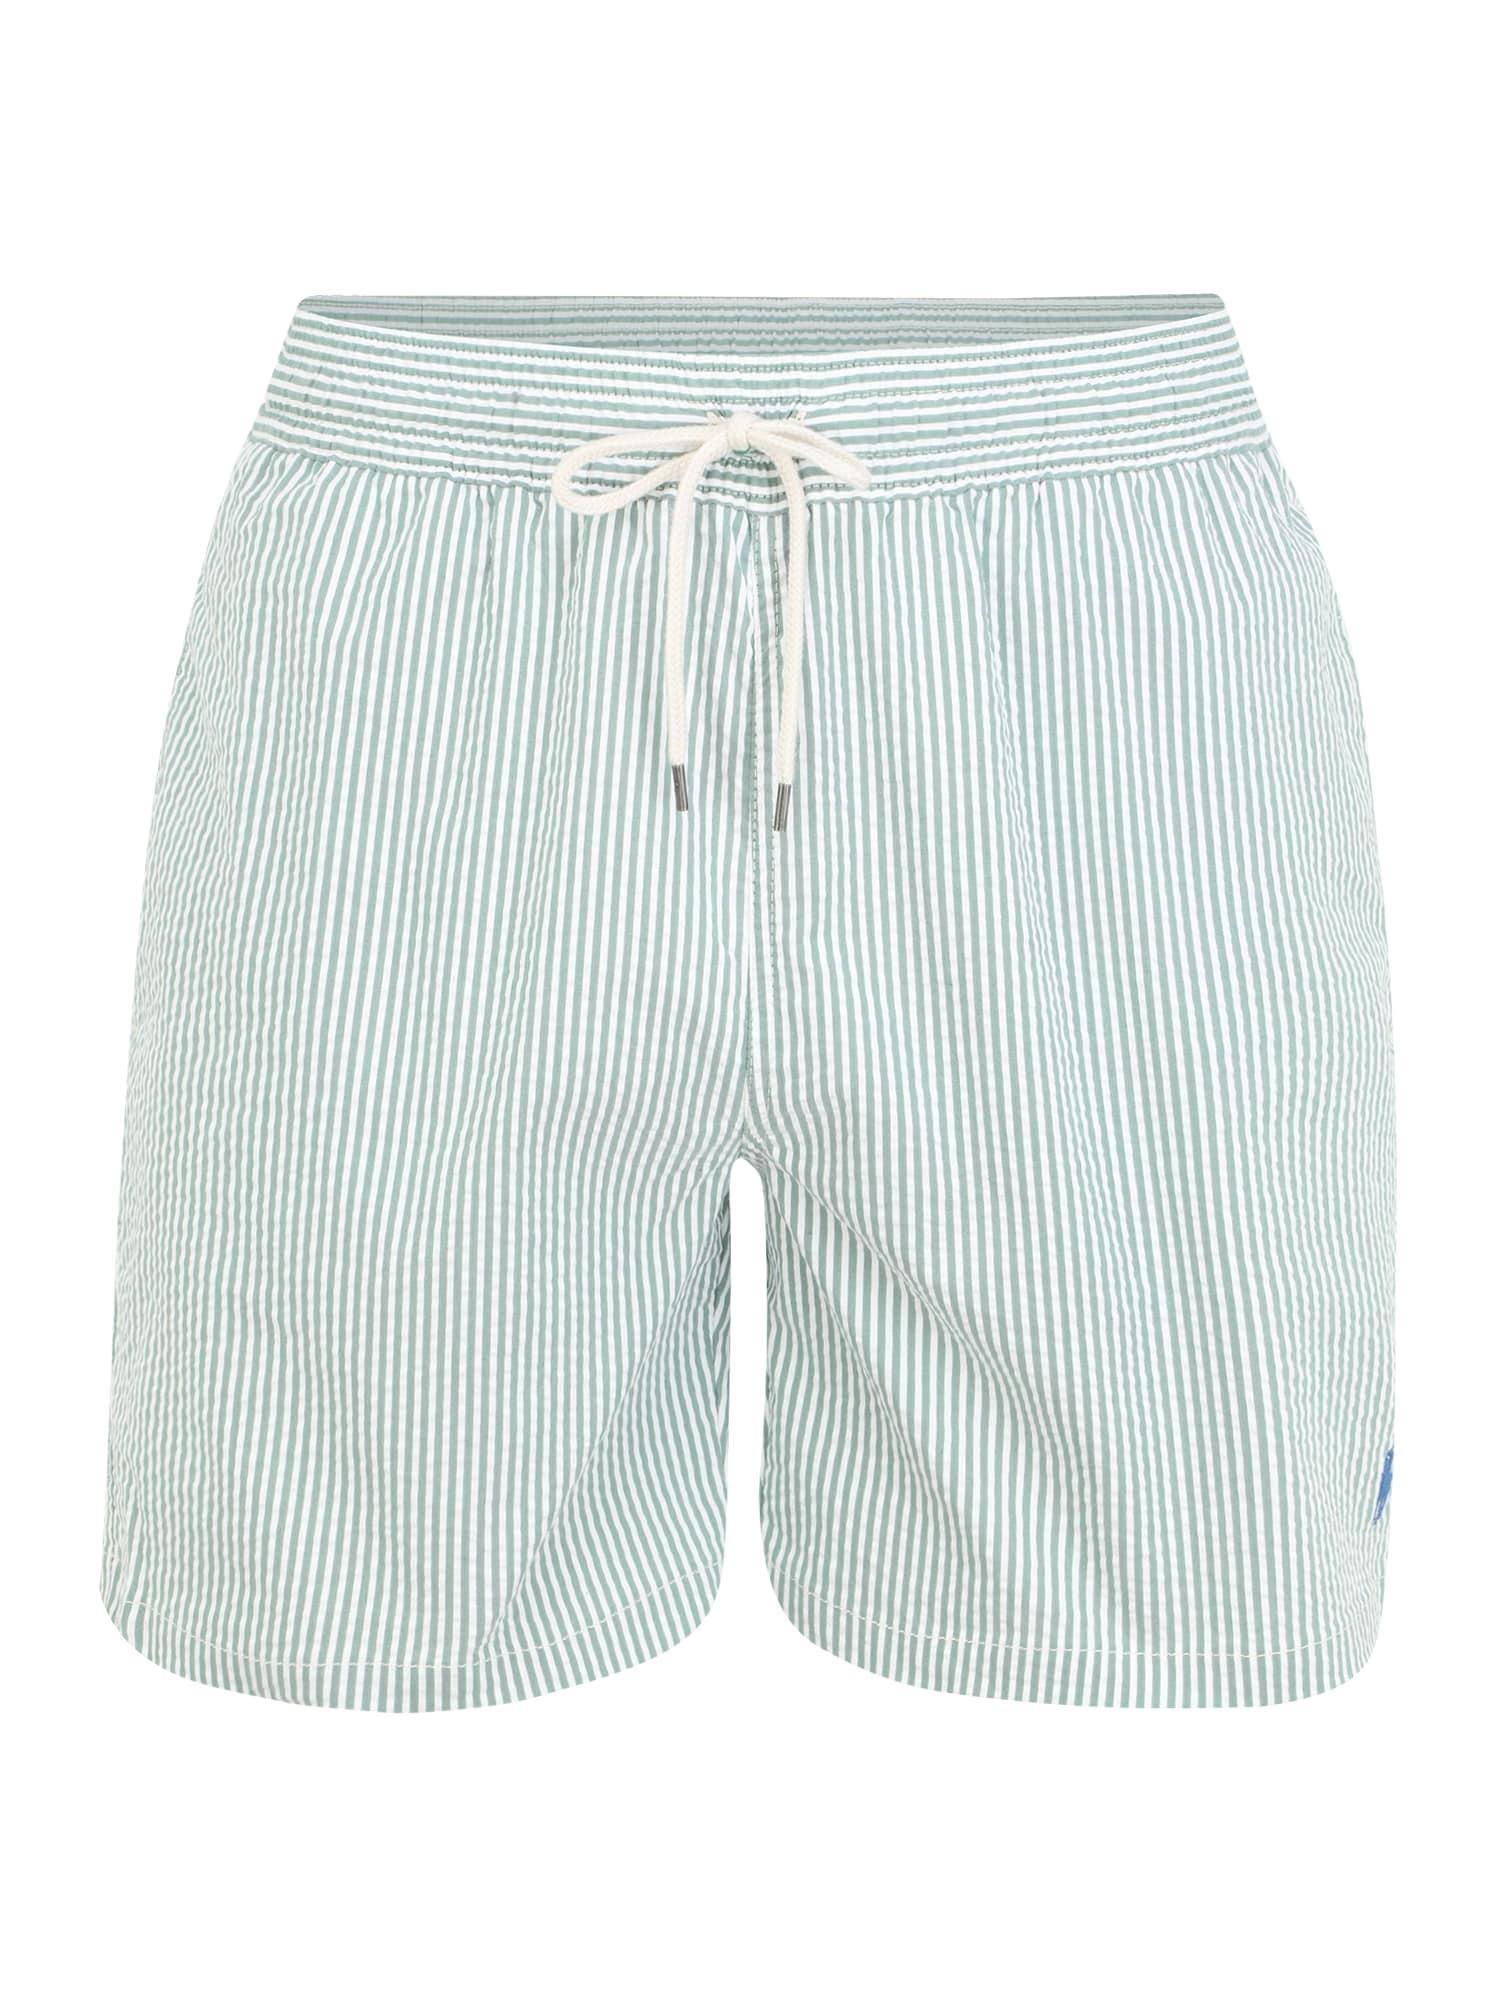 POLO RALPH LAUREN Plavecké šortky 'TRAVELER'  biela / pastelovo zelená